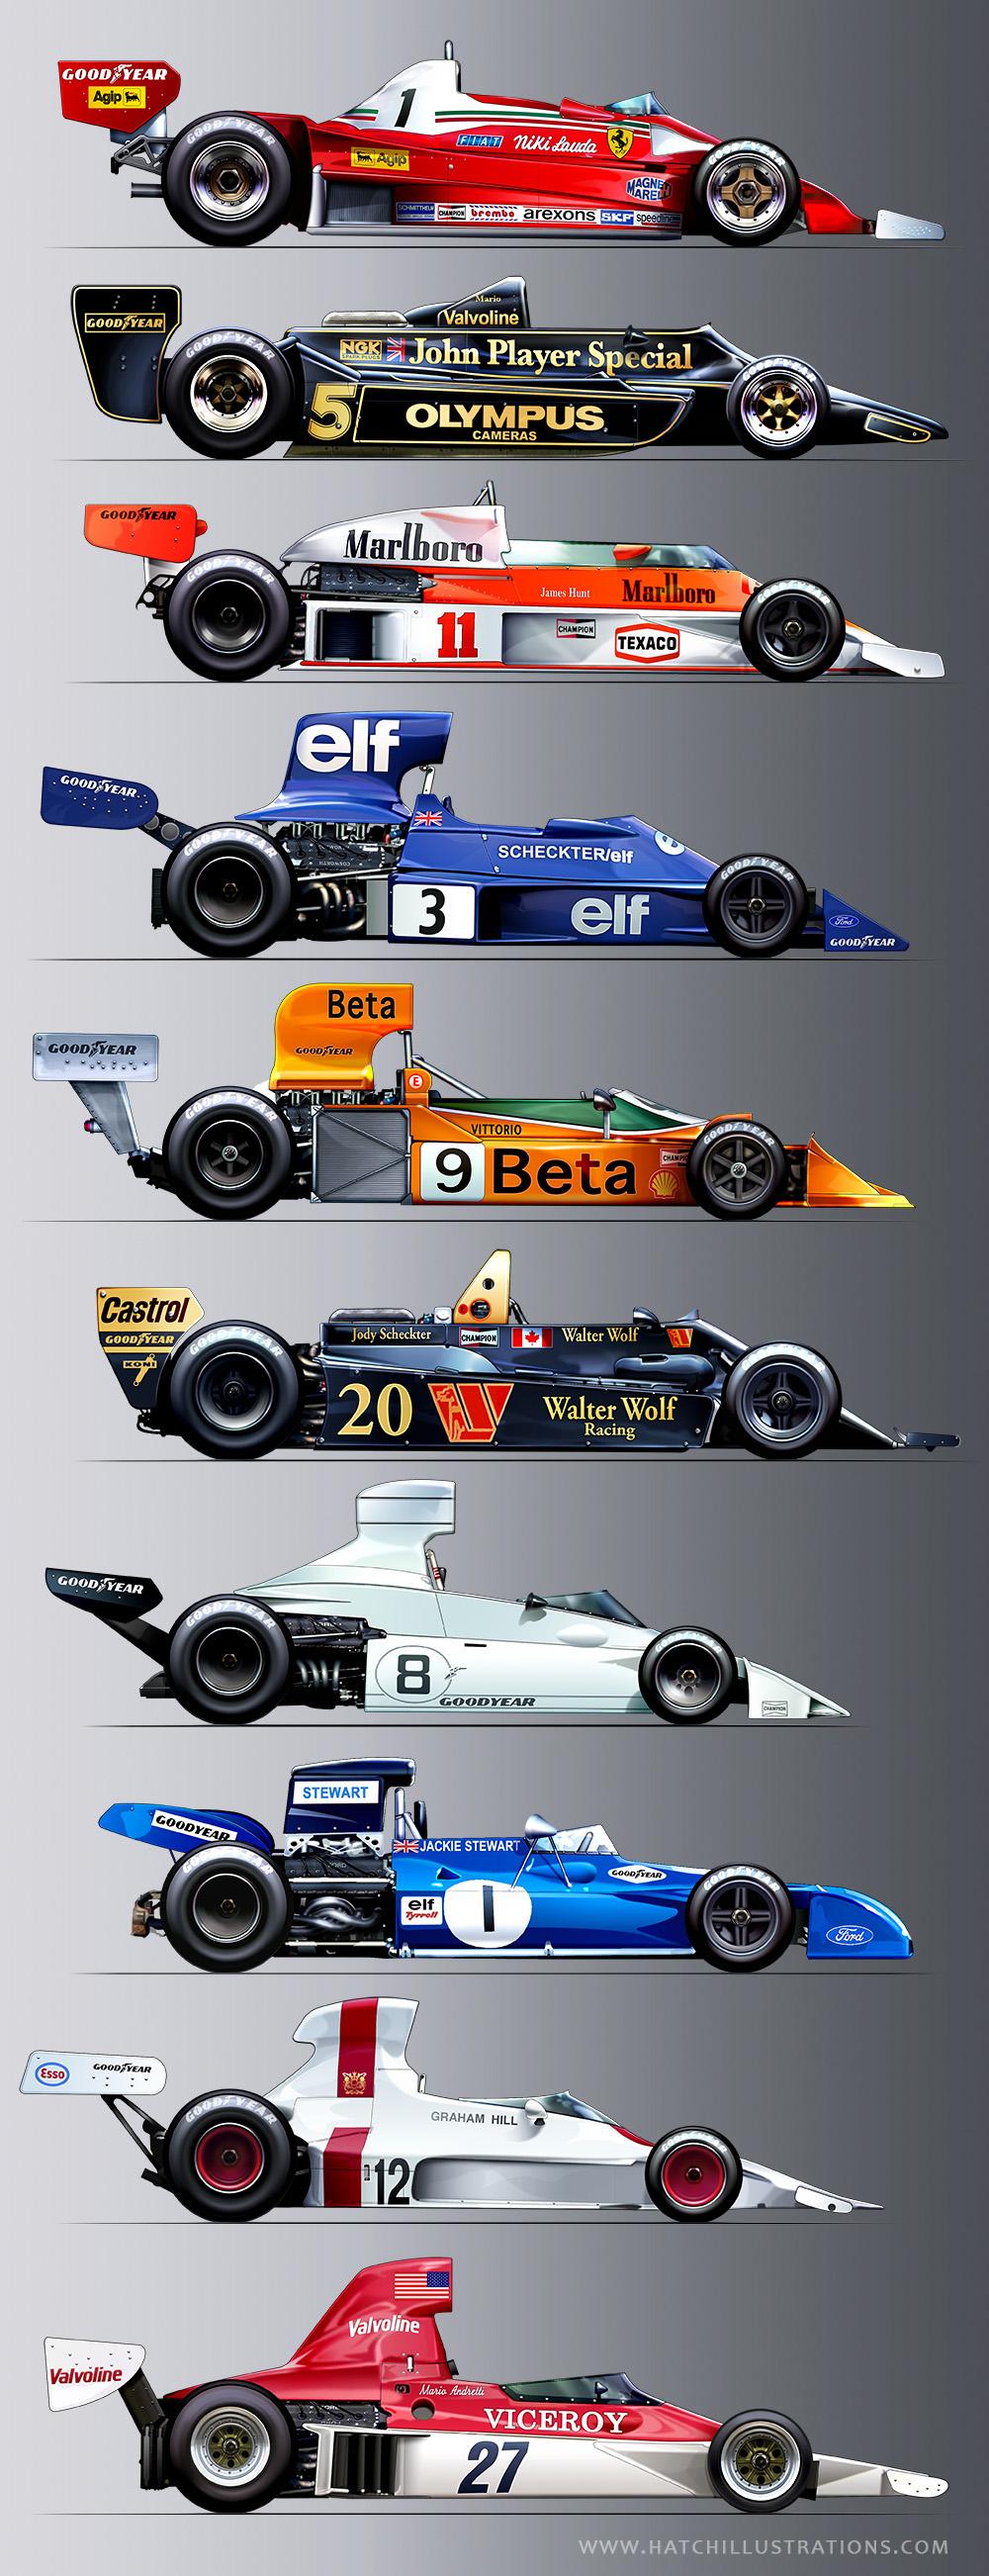 Cars of Historic Grand Prix